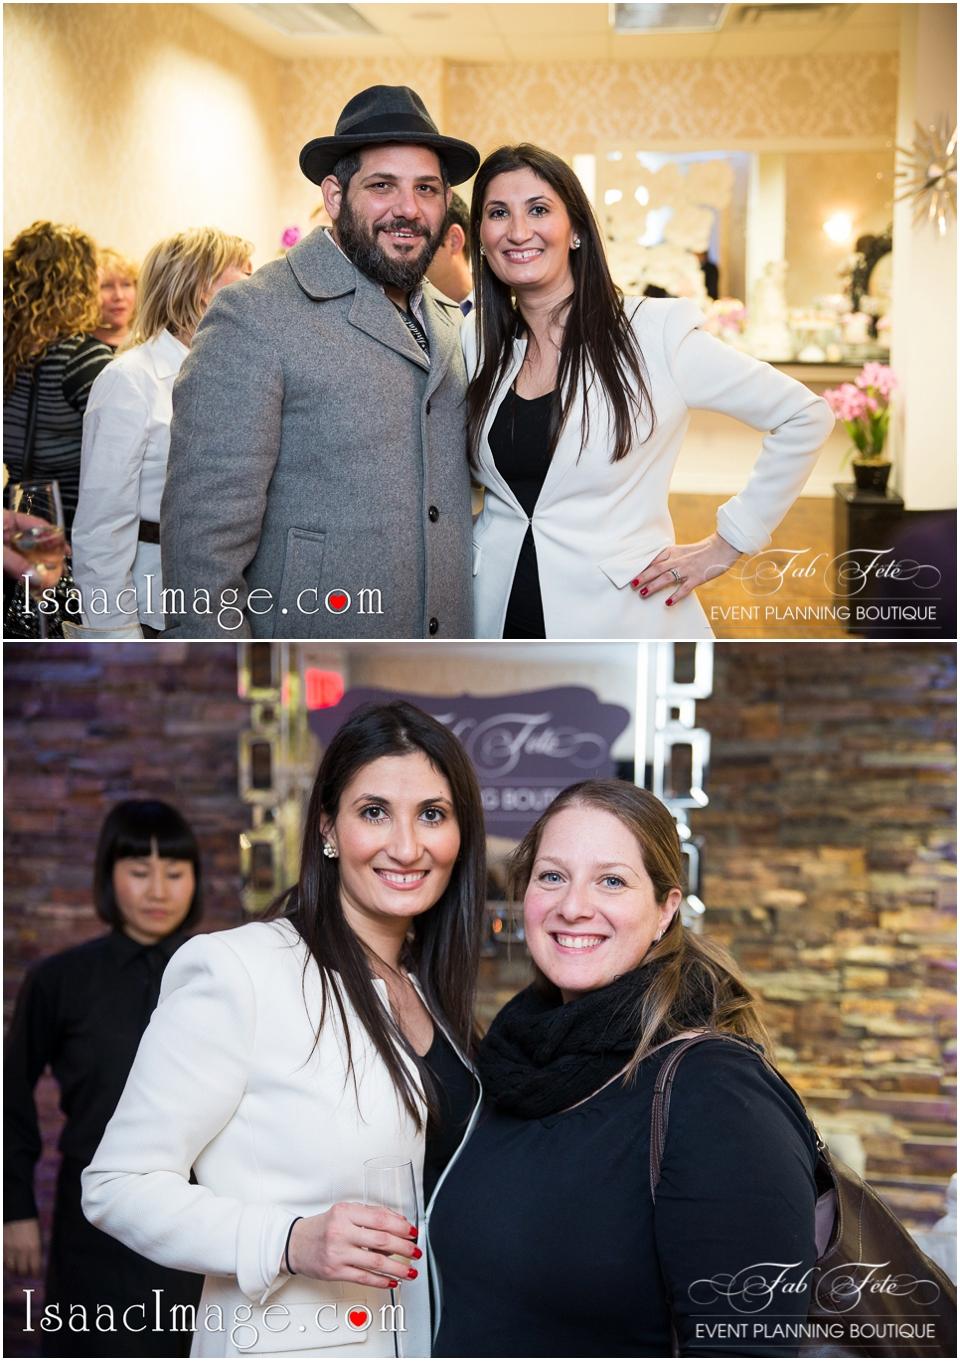 Fab Fete Toronto Wedding Event Planning Boutique open house_6482.jpg